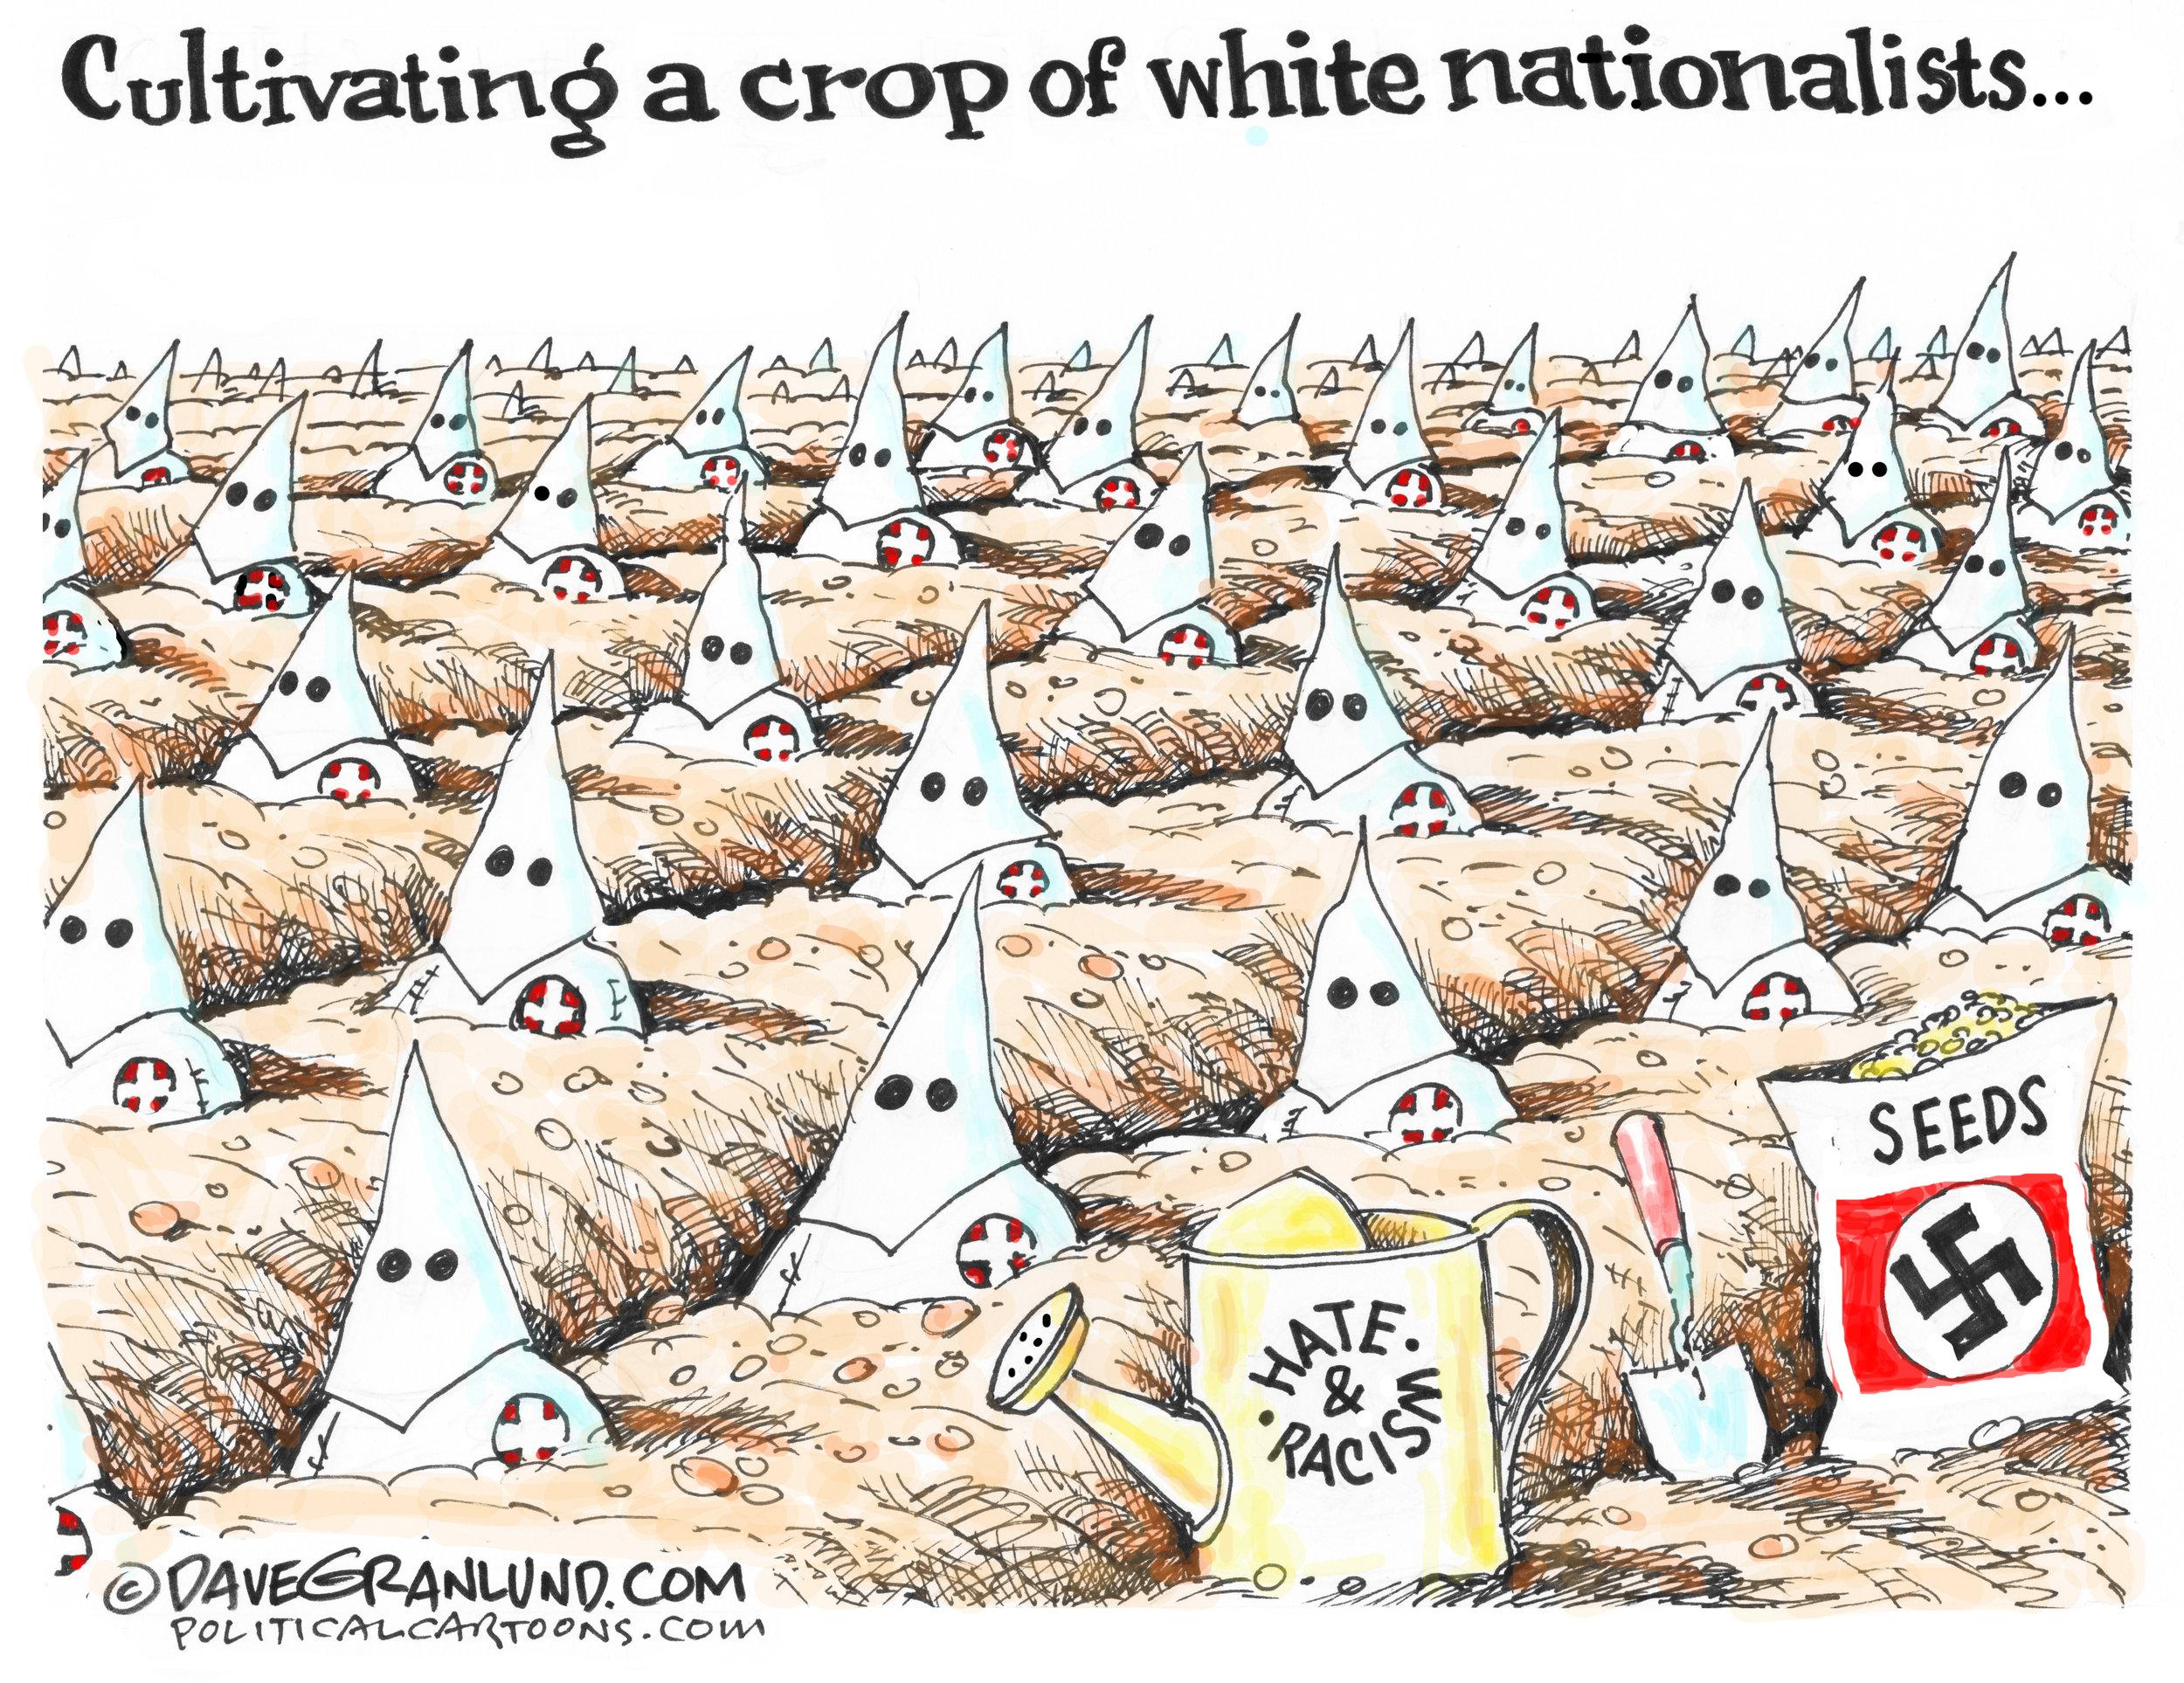 Crop of white nationalists ( Dave Granlund , PoliticalCartoons.com)